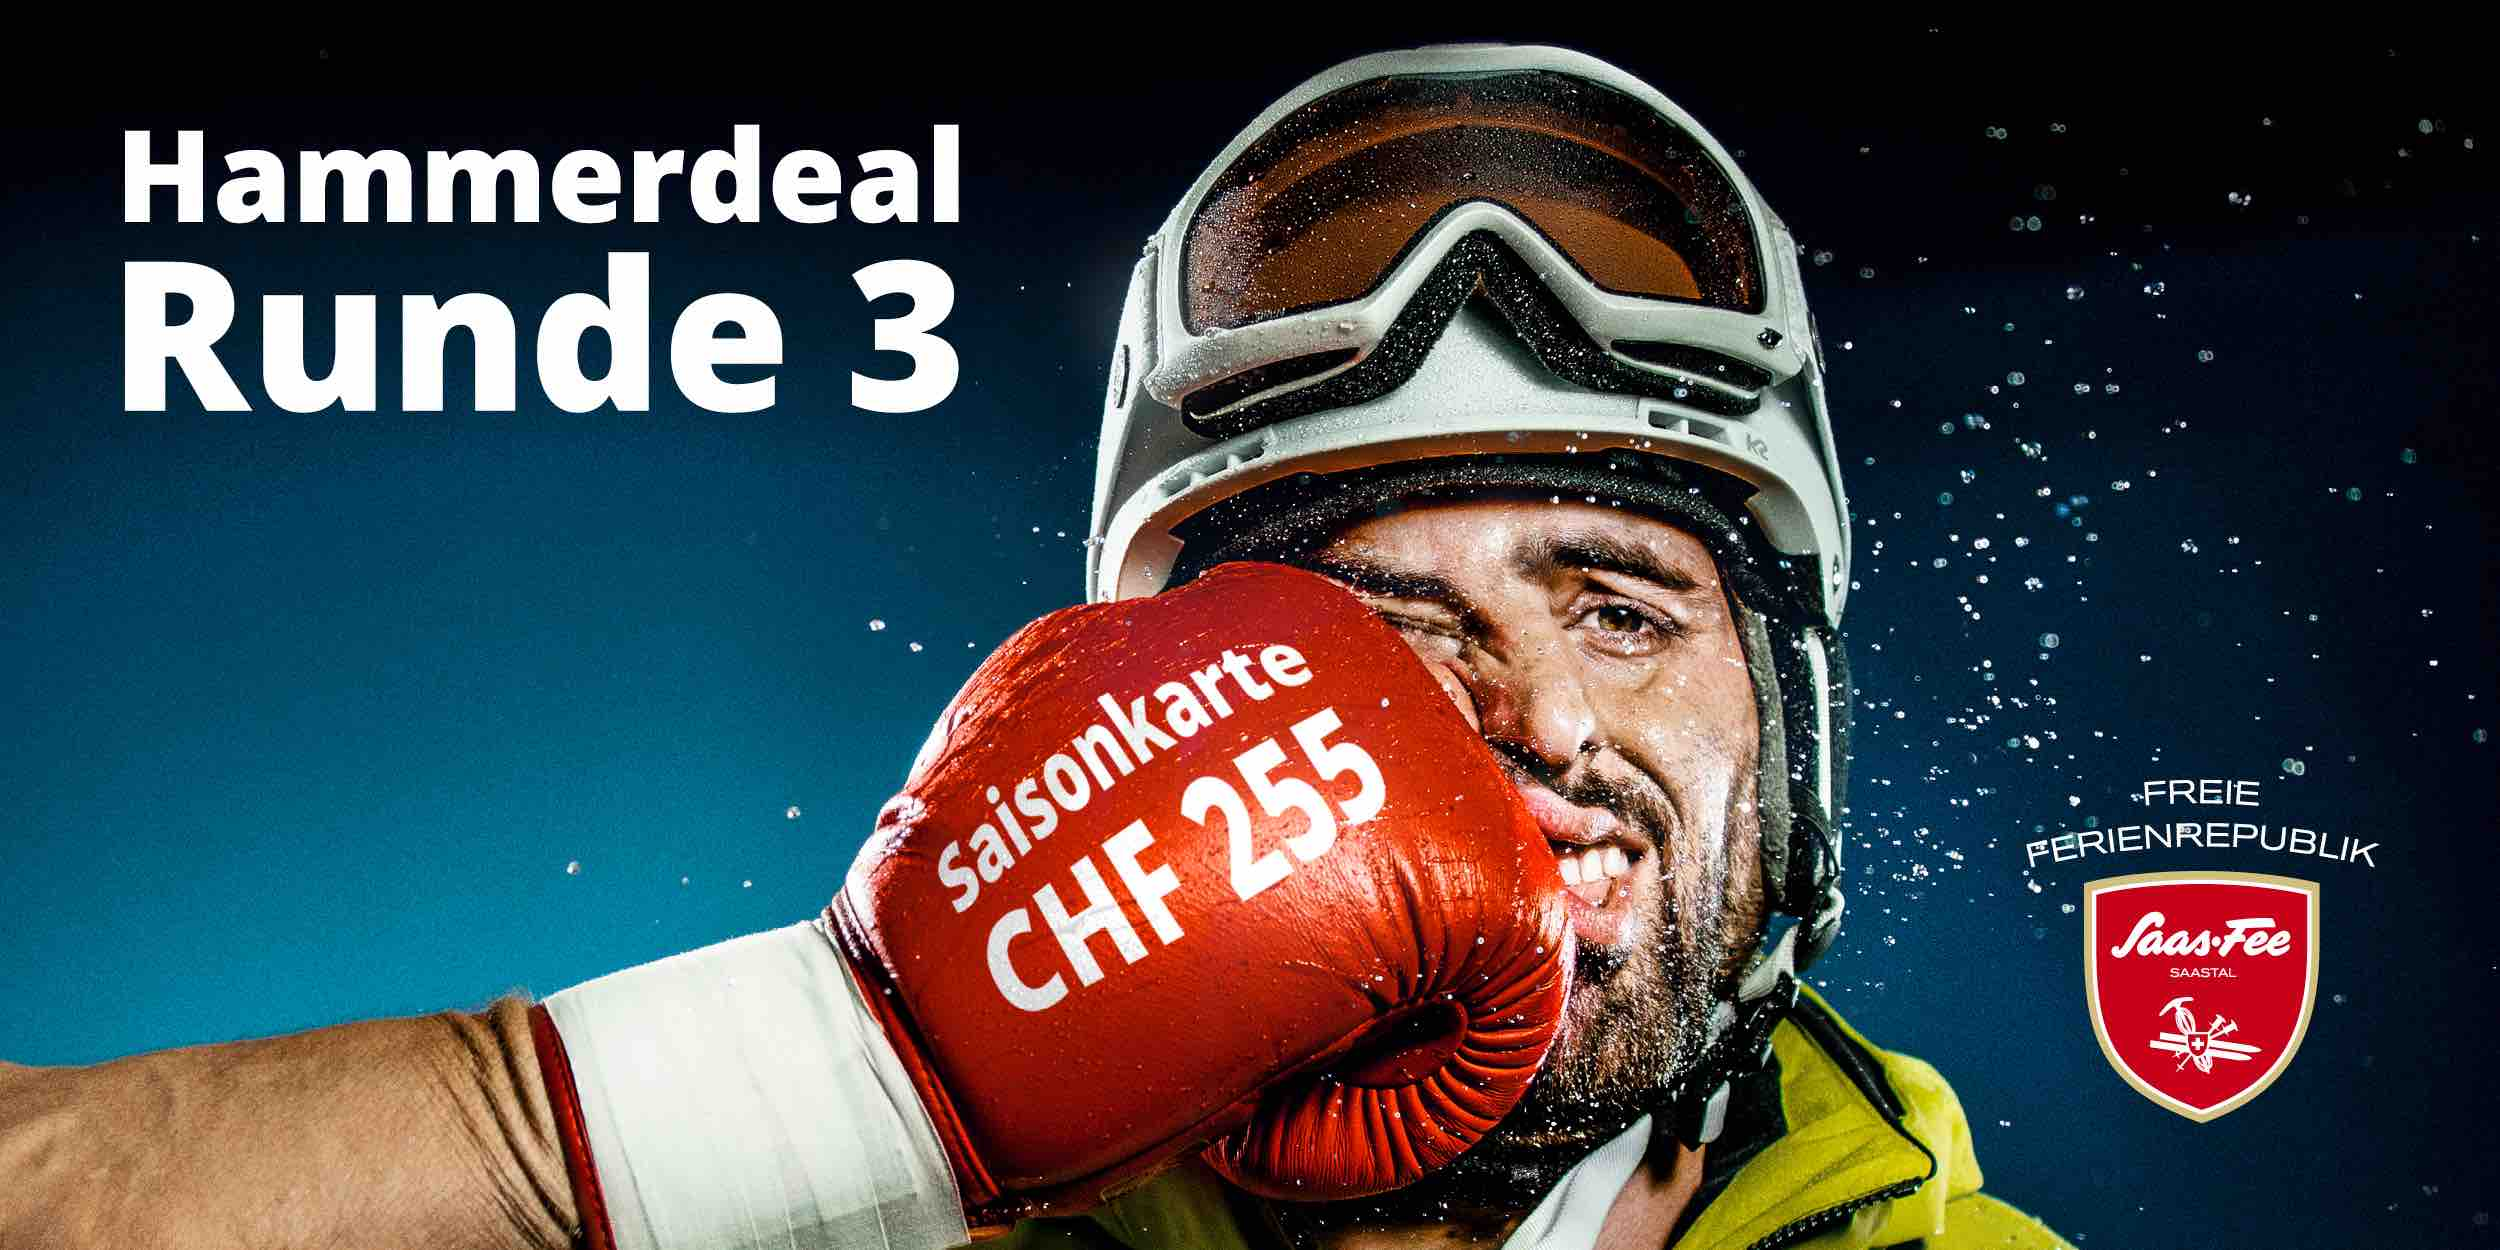 WinterCARD Hammerdeal Runde 3